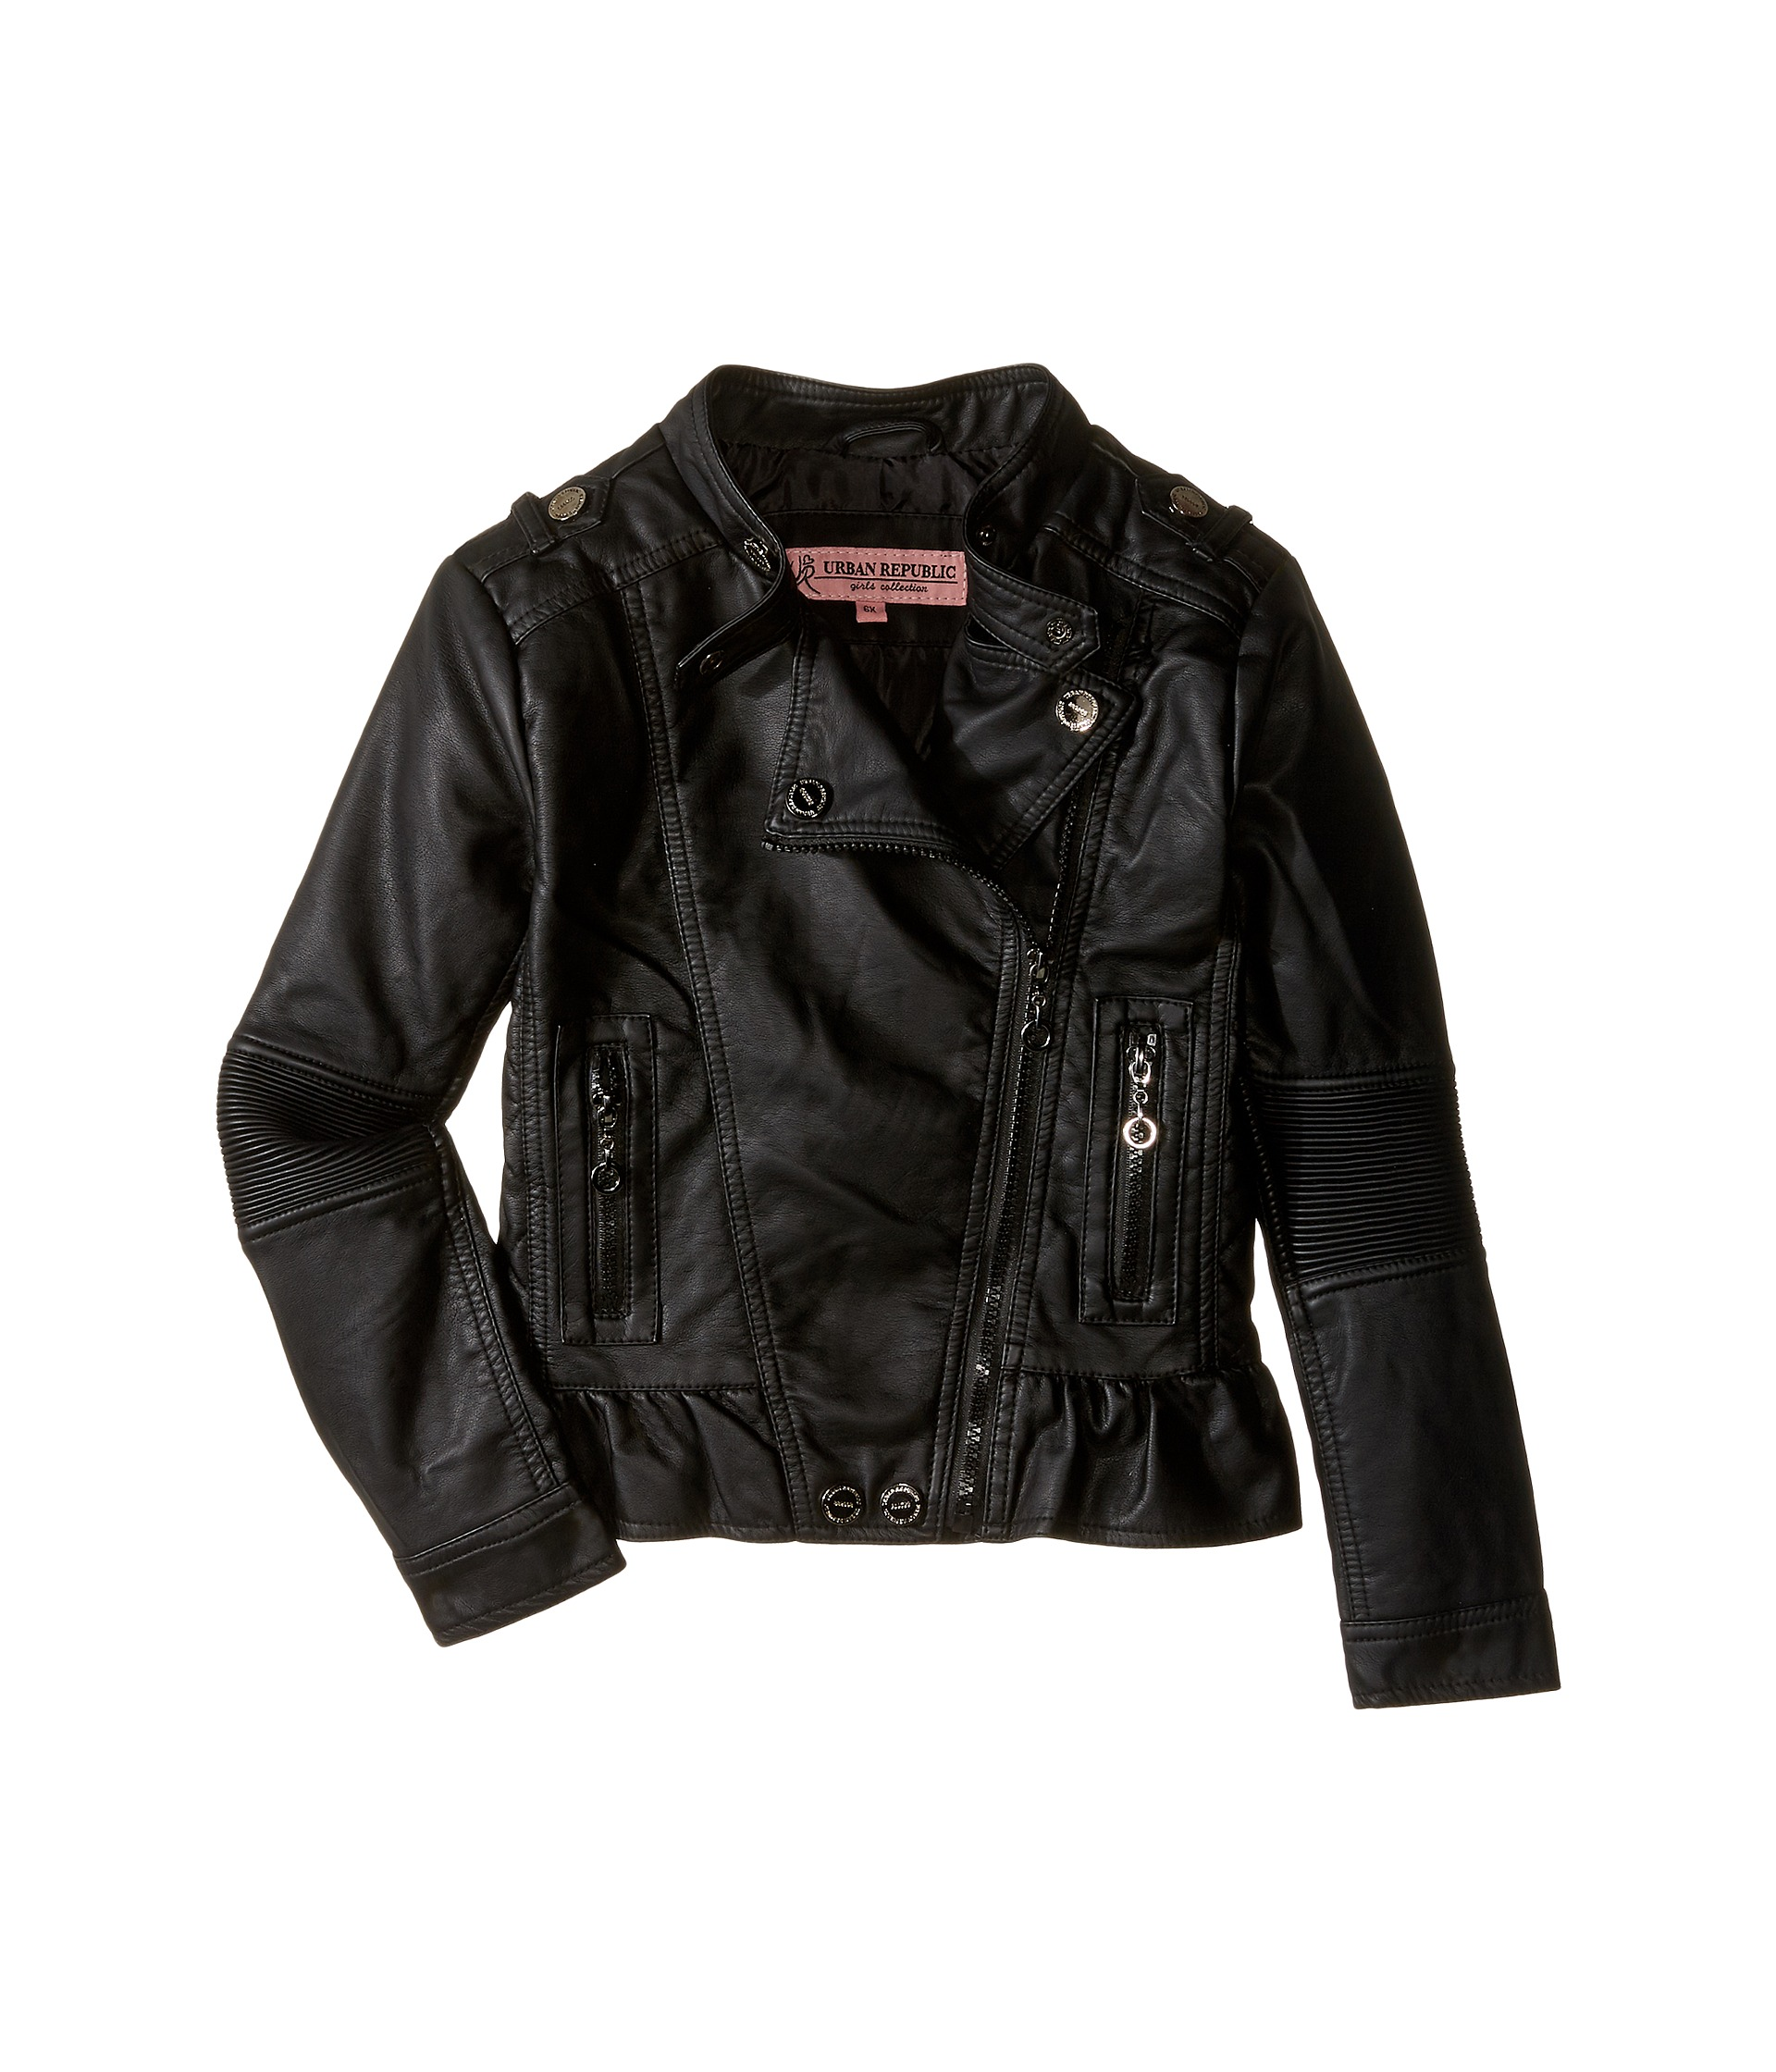 Black leather jackets for kids